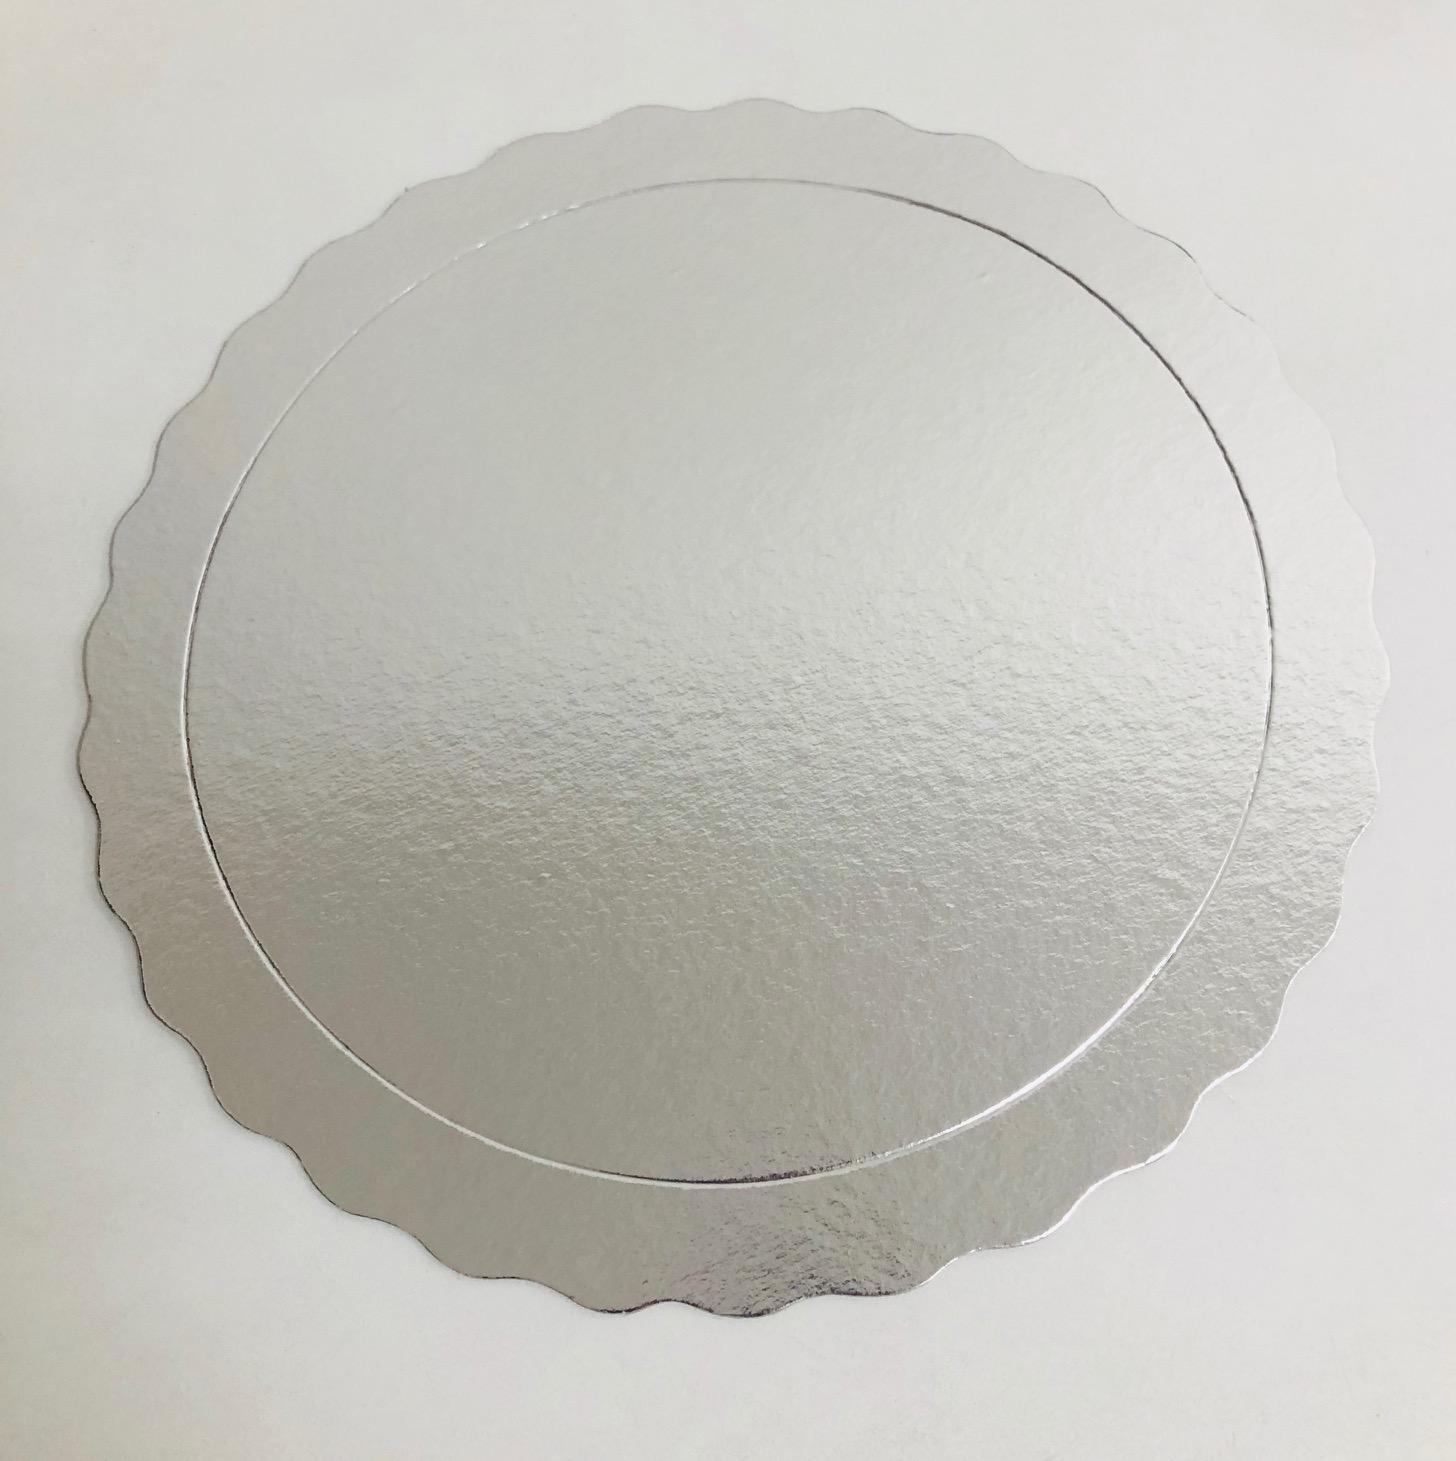 Kit 100 Bases Laminadas Para Bolo, Cake Board, 20 e 25cm - Prata